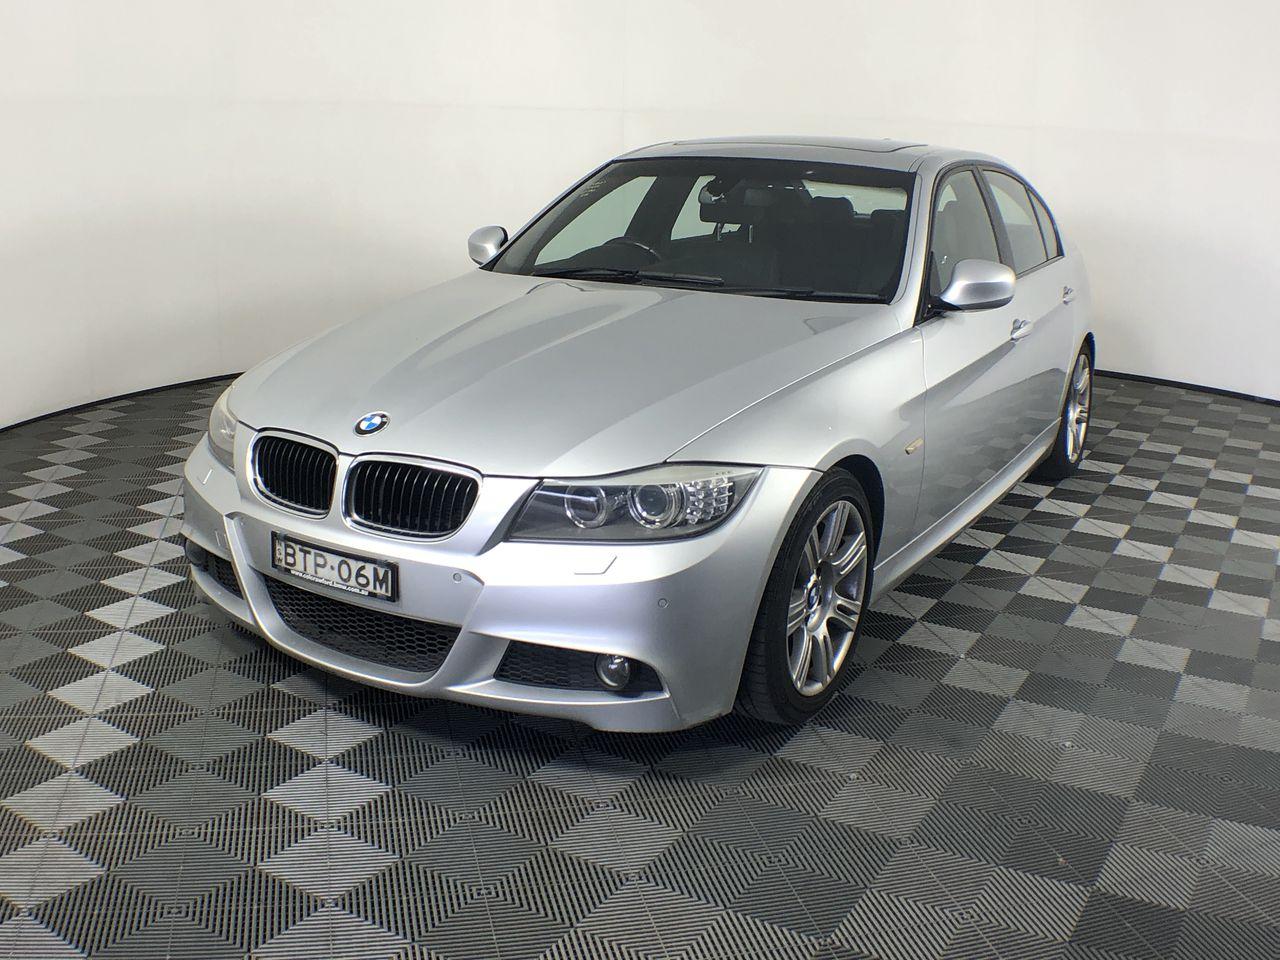 2010 BMW 3 Series 320i EXEC. E90 Automatic Sedan